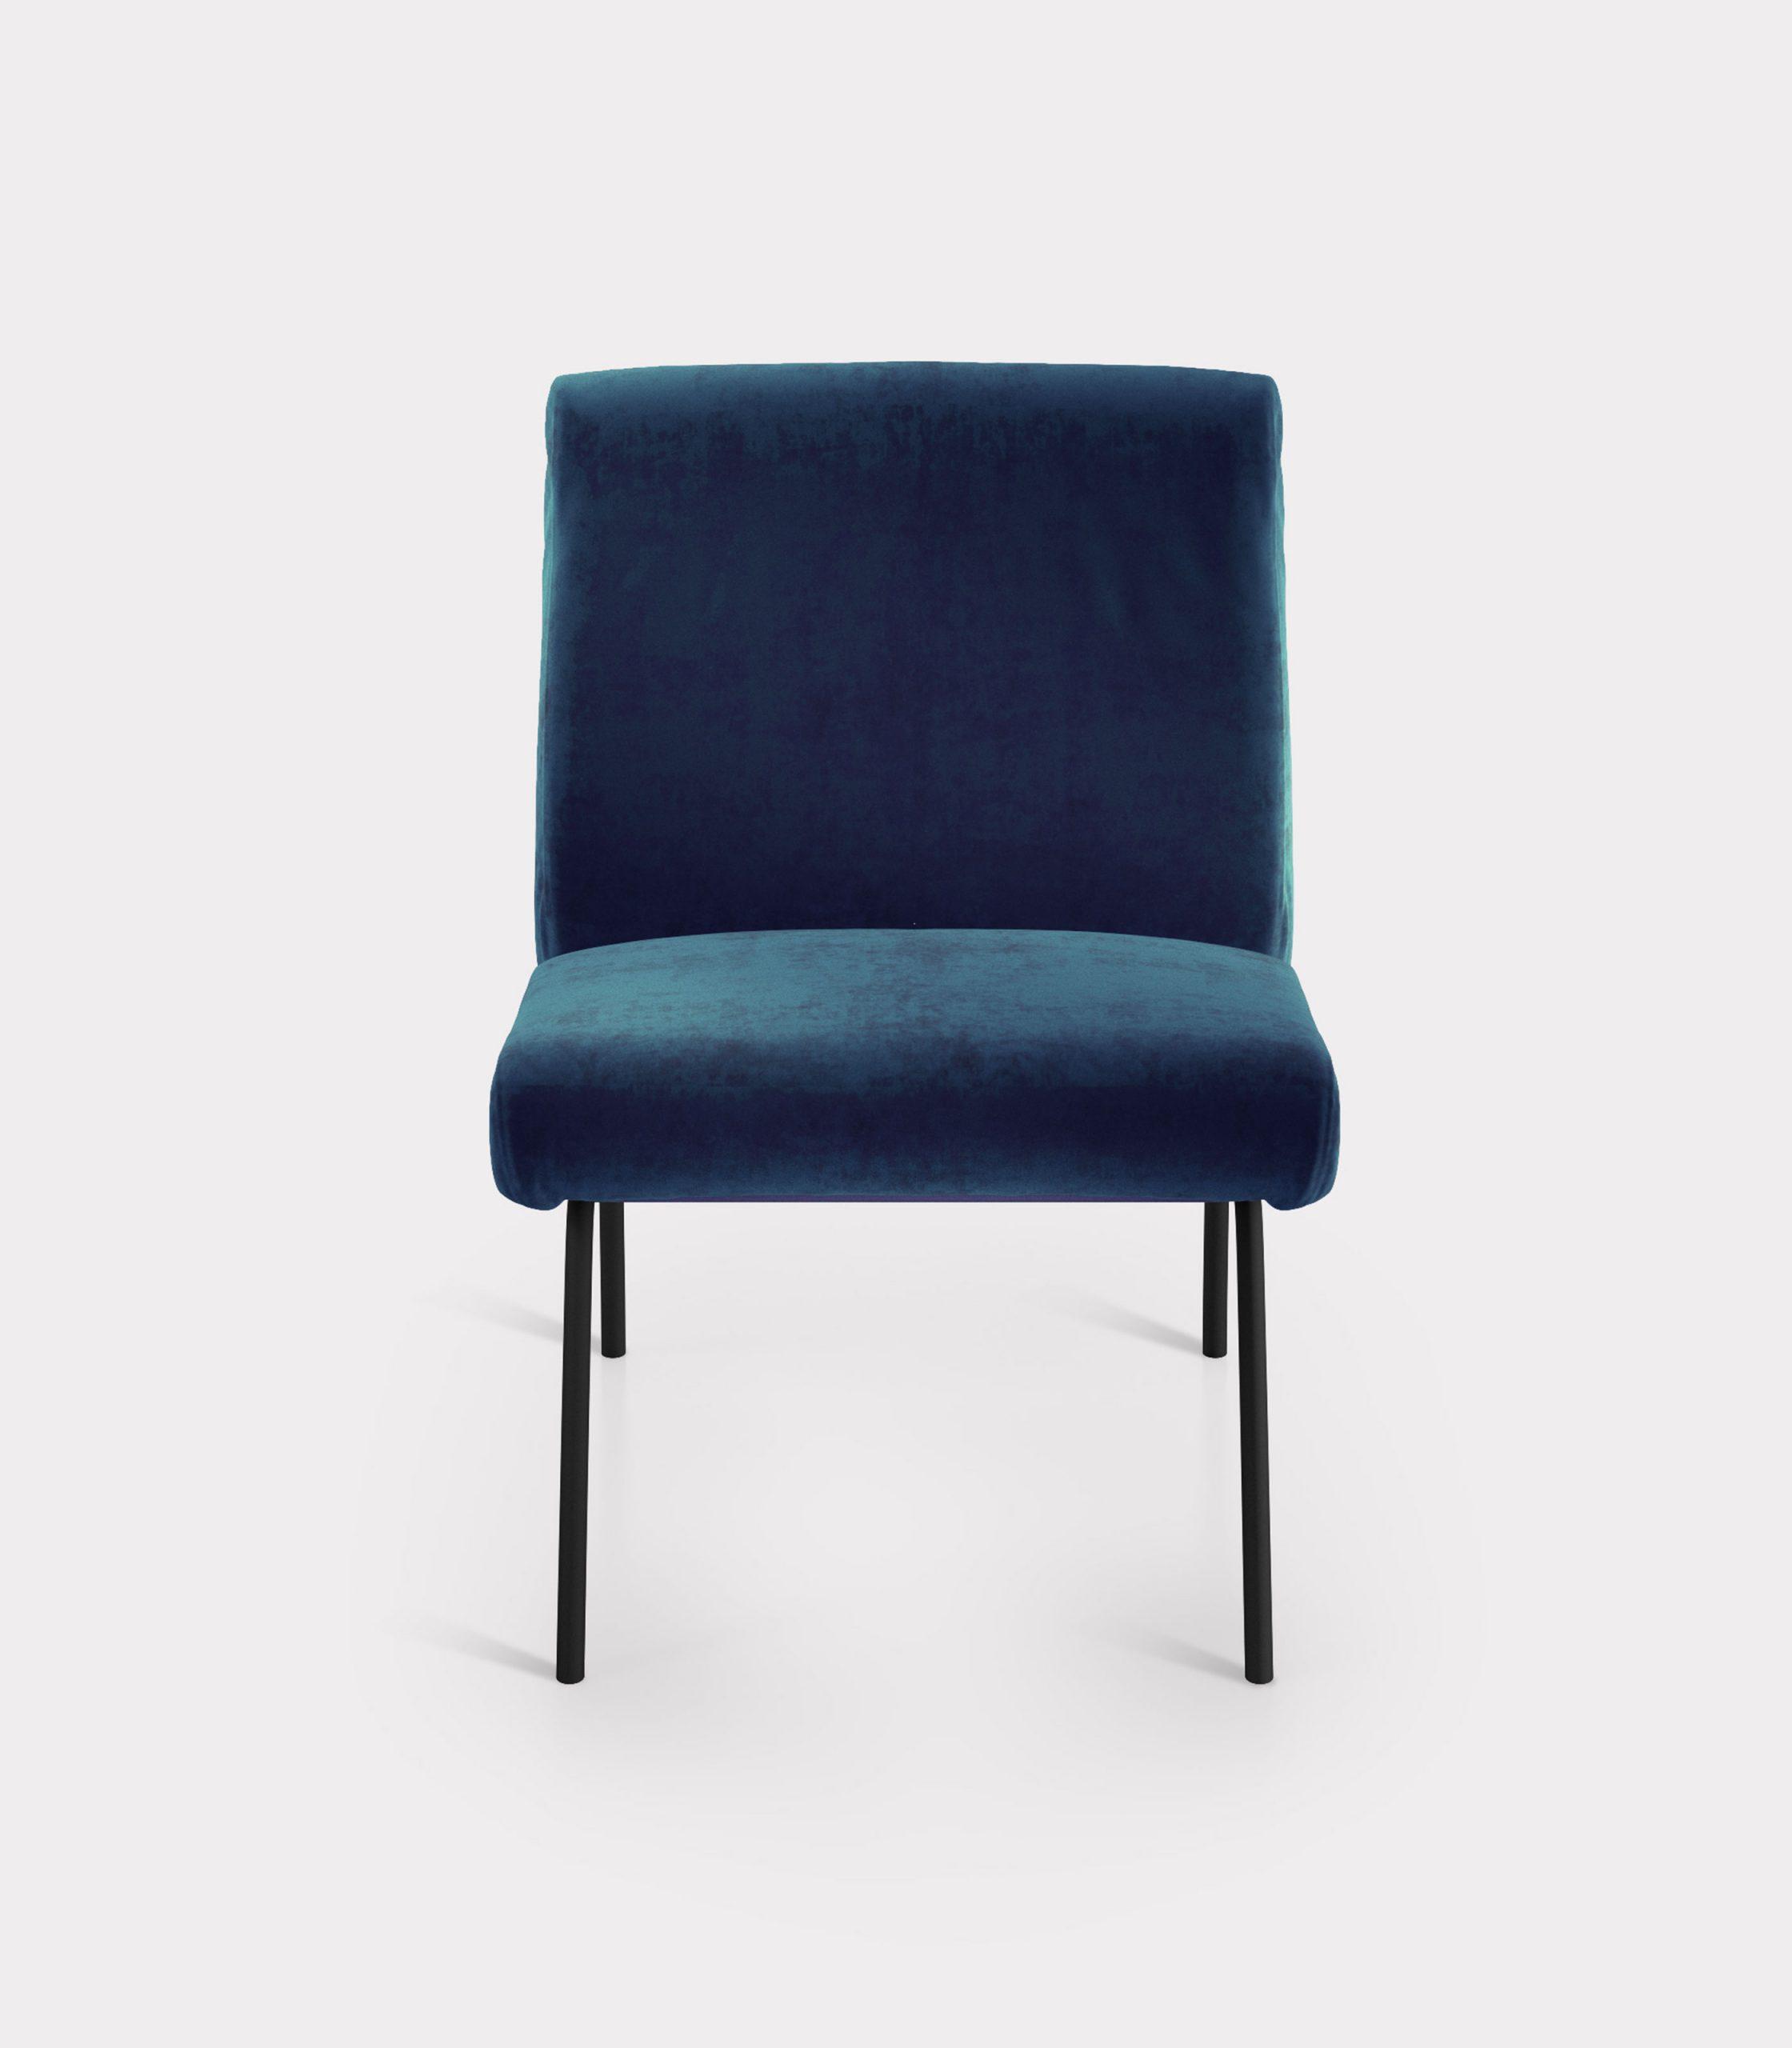 Blue armchair in velvet fabric loopo milan design F